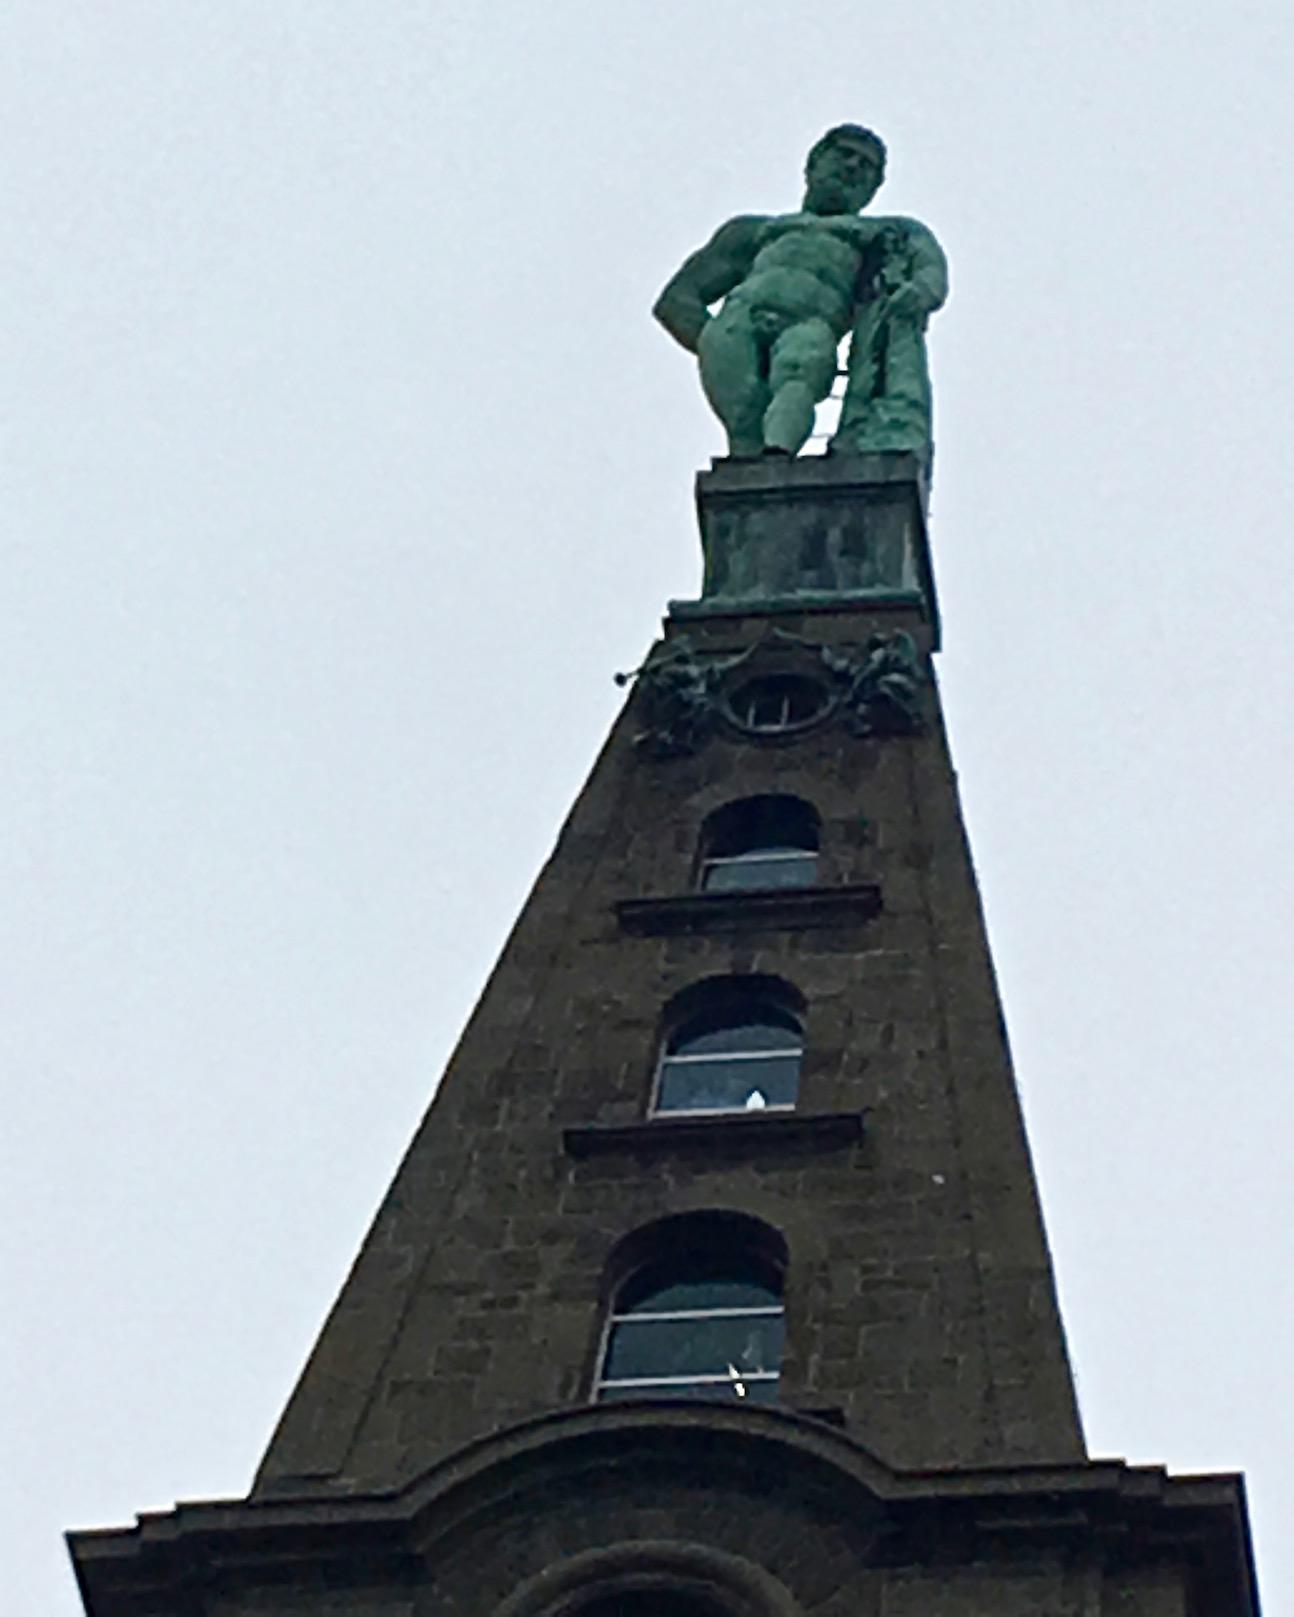 Herkulesfigur im Bergpark Wilhelmshöhe Kassel